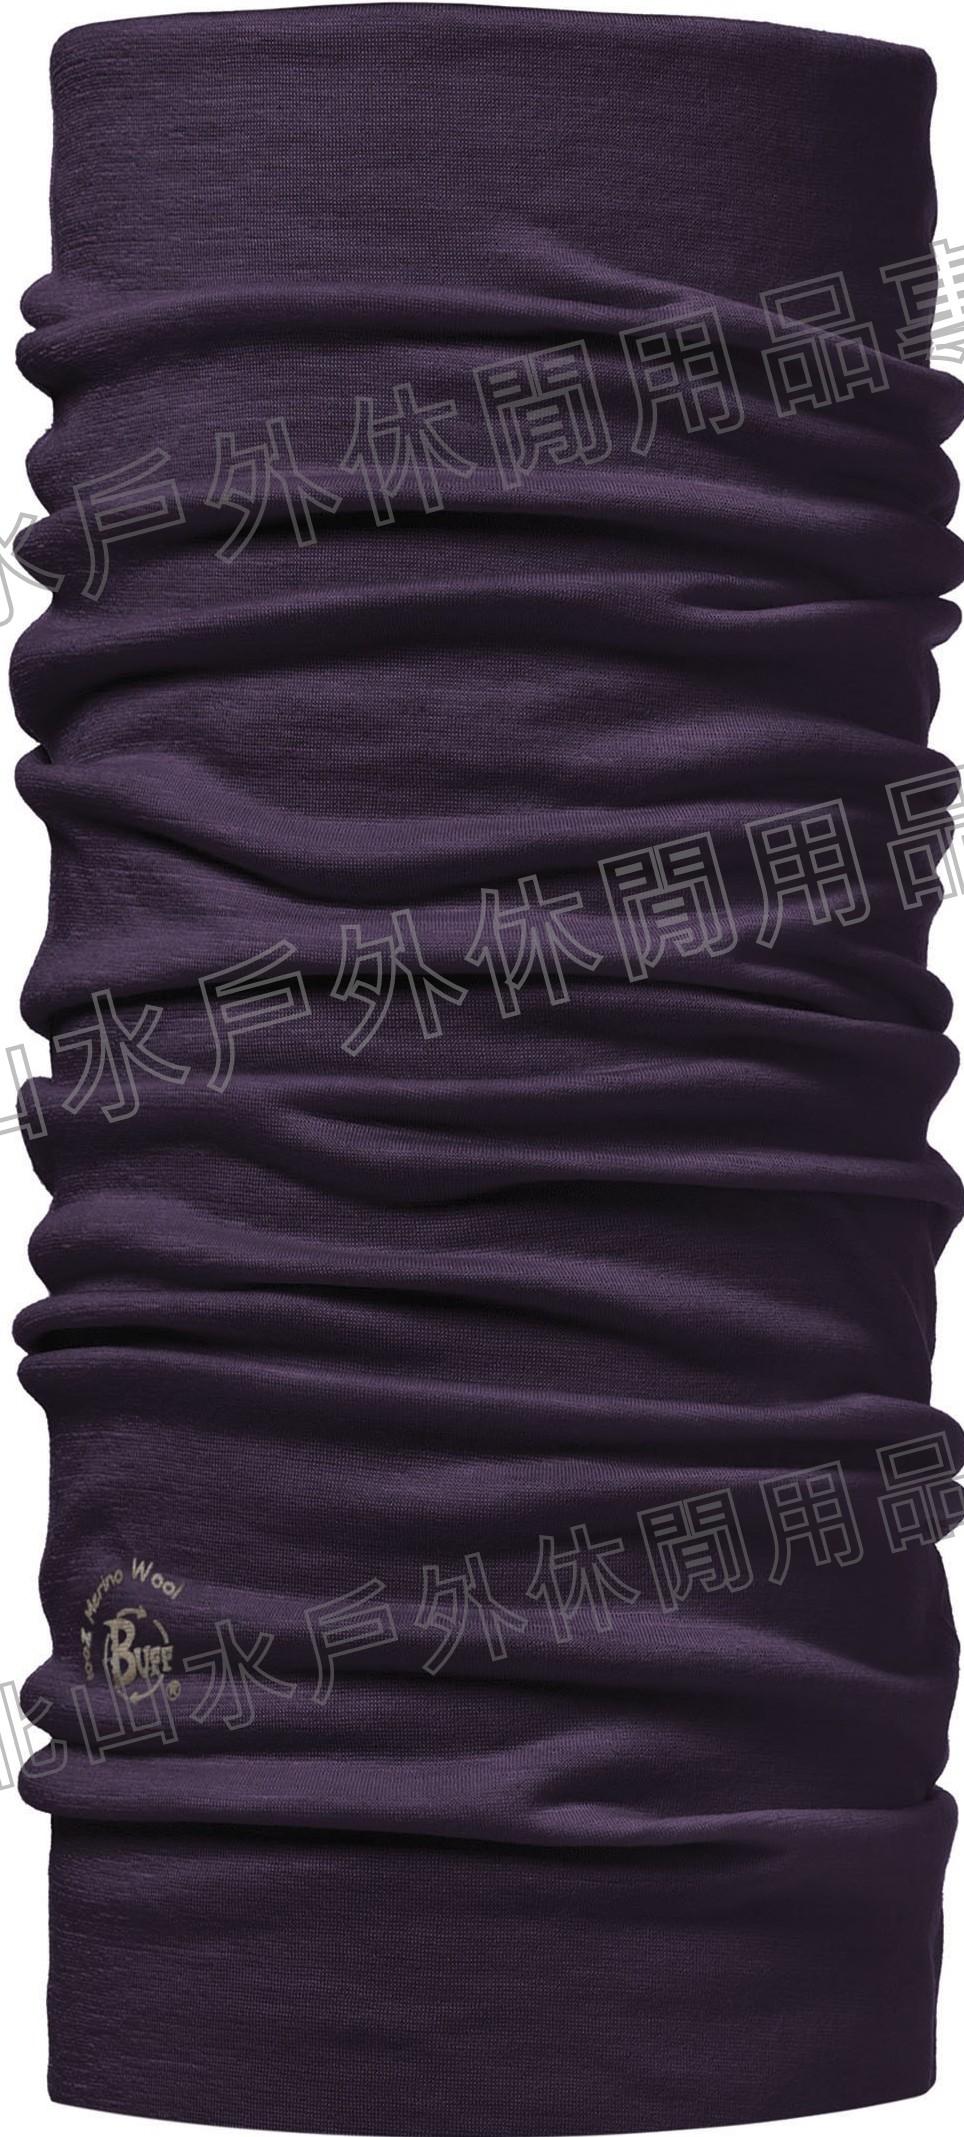 [ Buff ] 羊毛頭巾/健行/滑雪/出國/旅遊 素色美麗諾羊毛 WOOL BUFF 100638 紫色葡萄